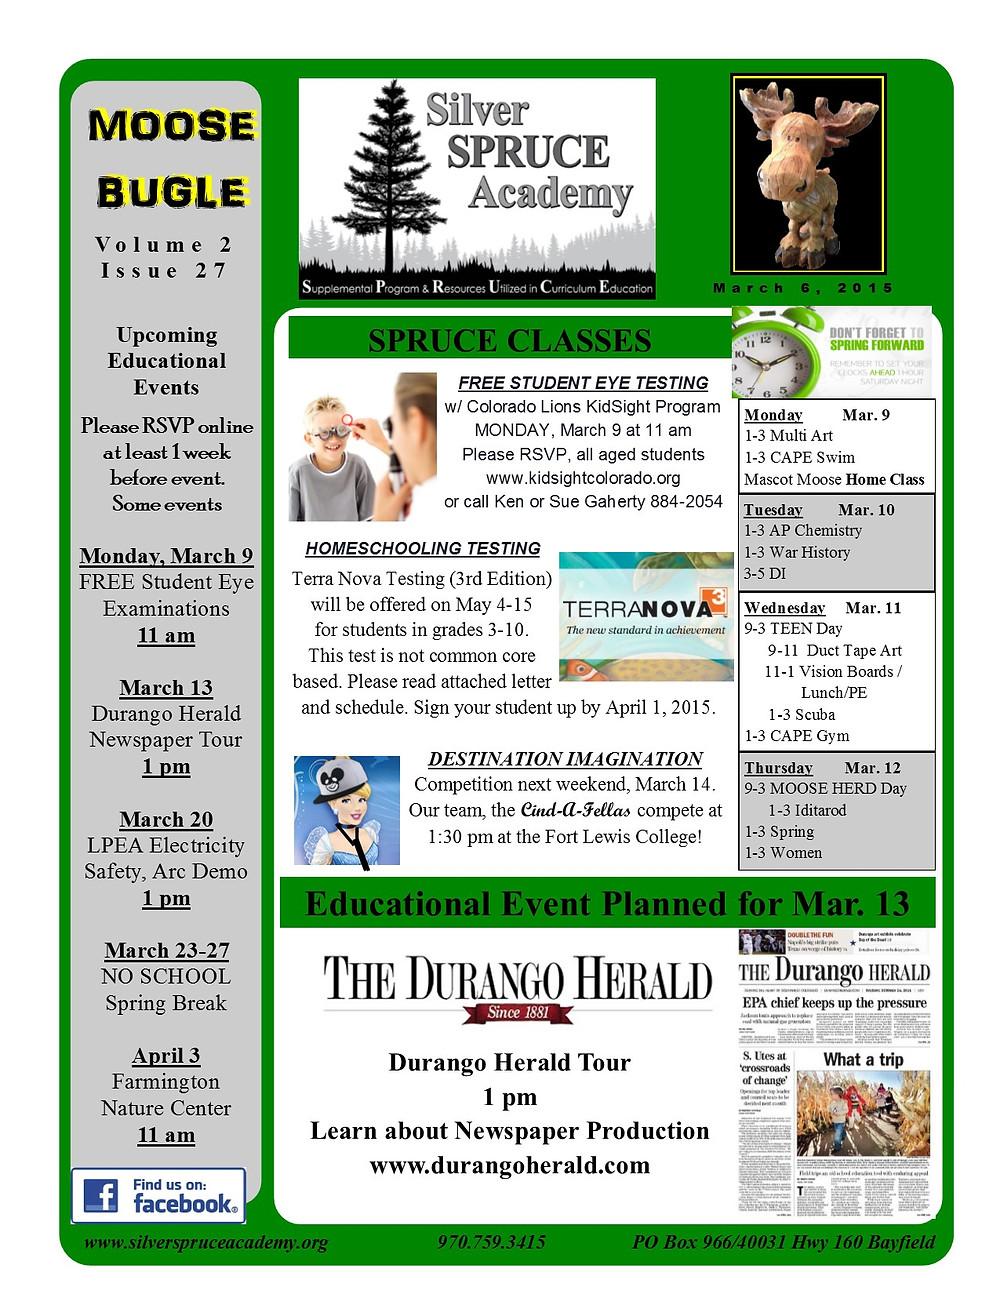 Moose Bugle 3-6-15 (Page 1).jpg